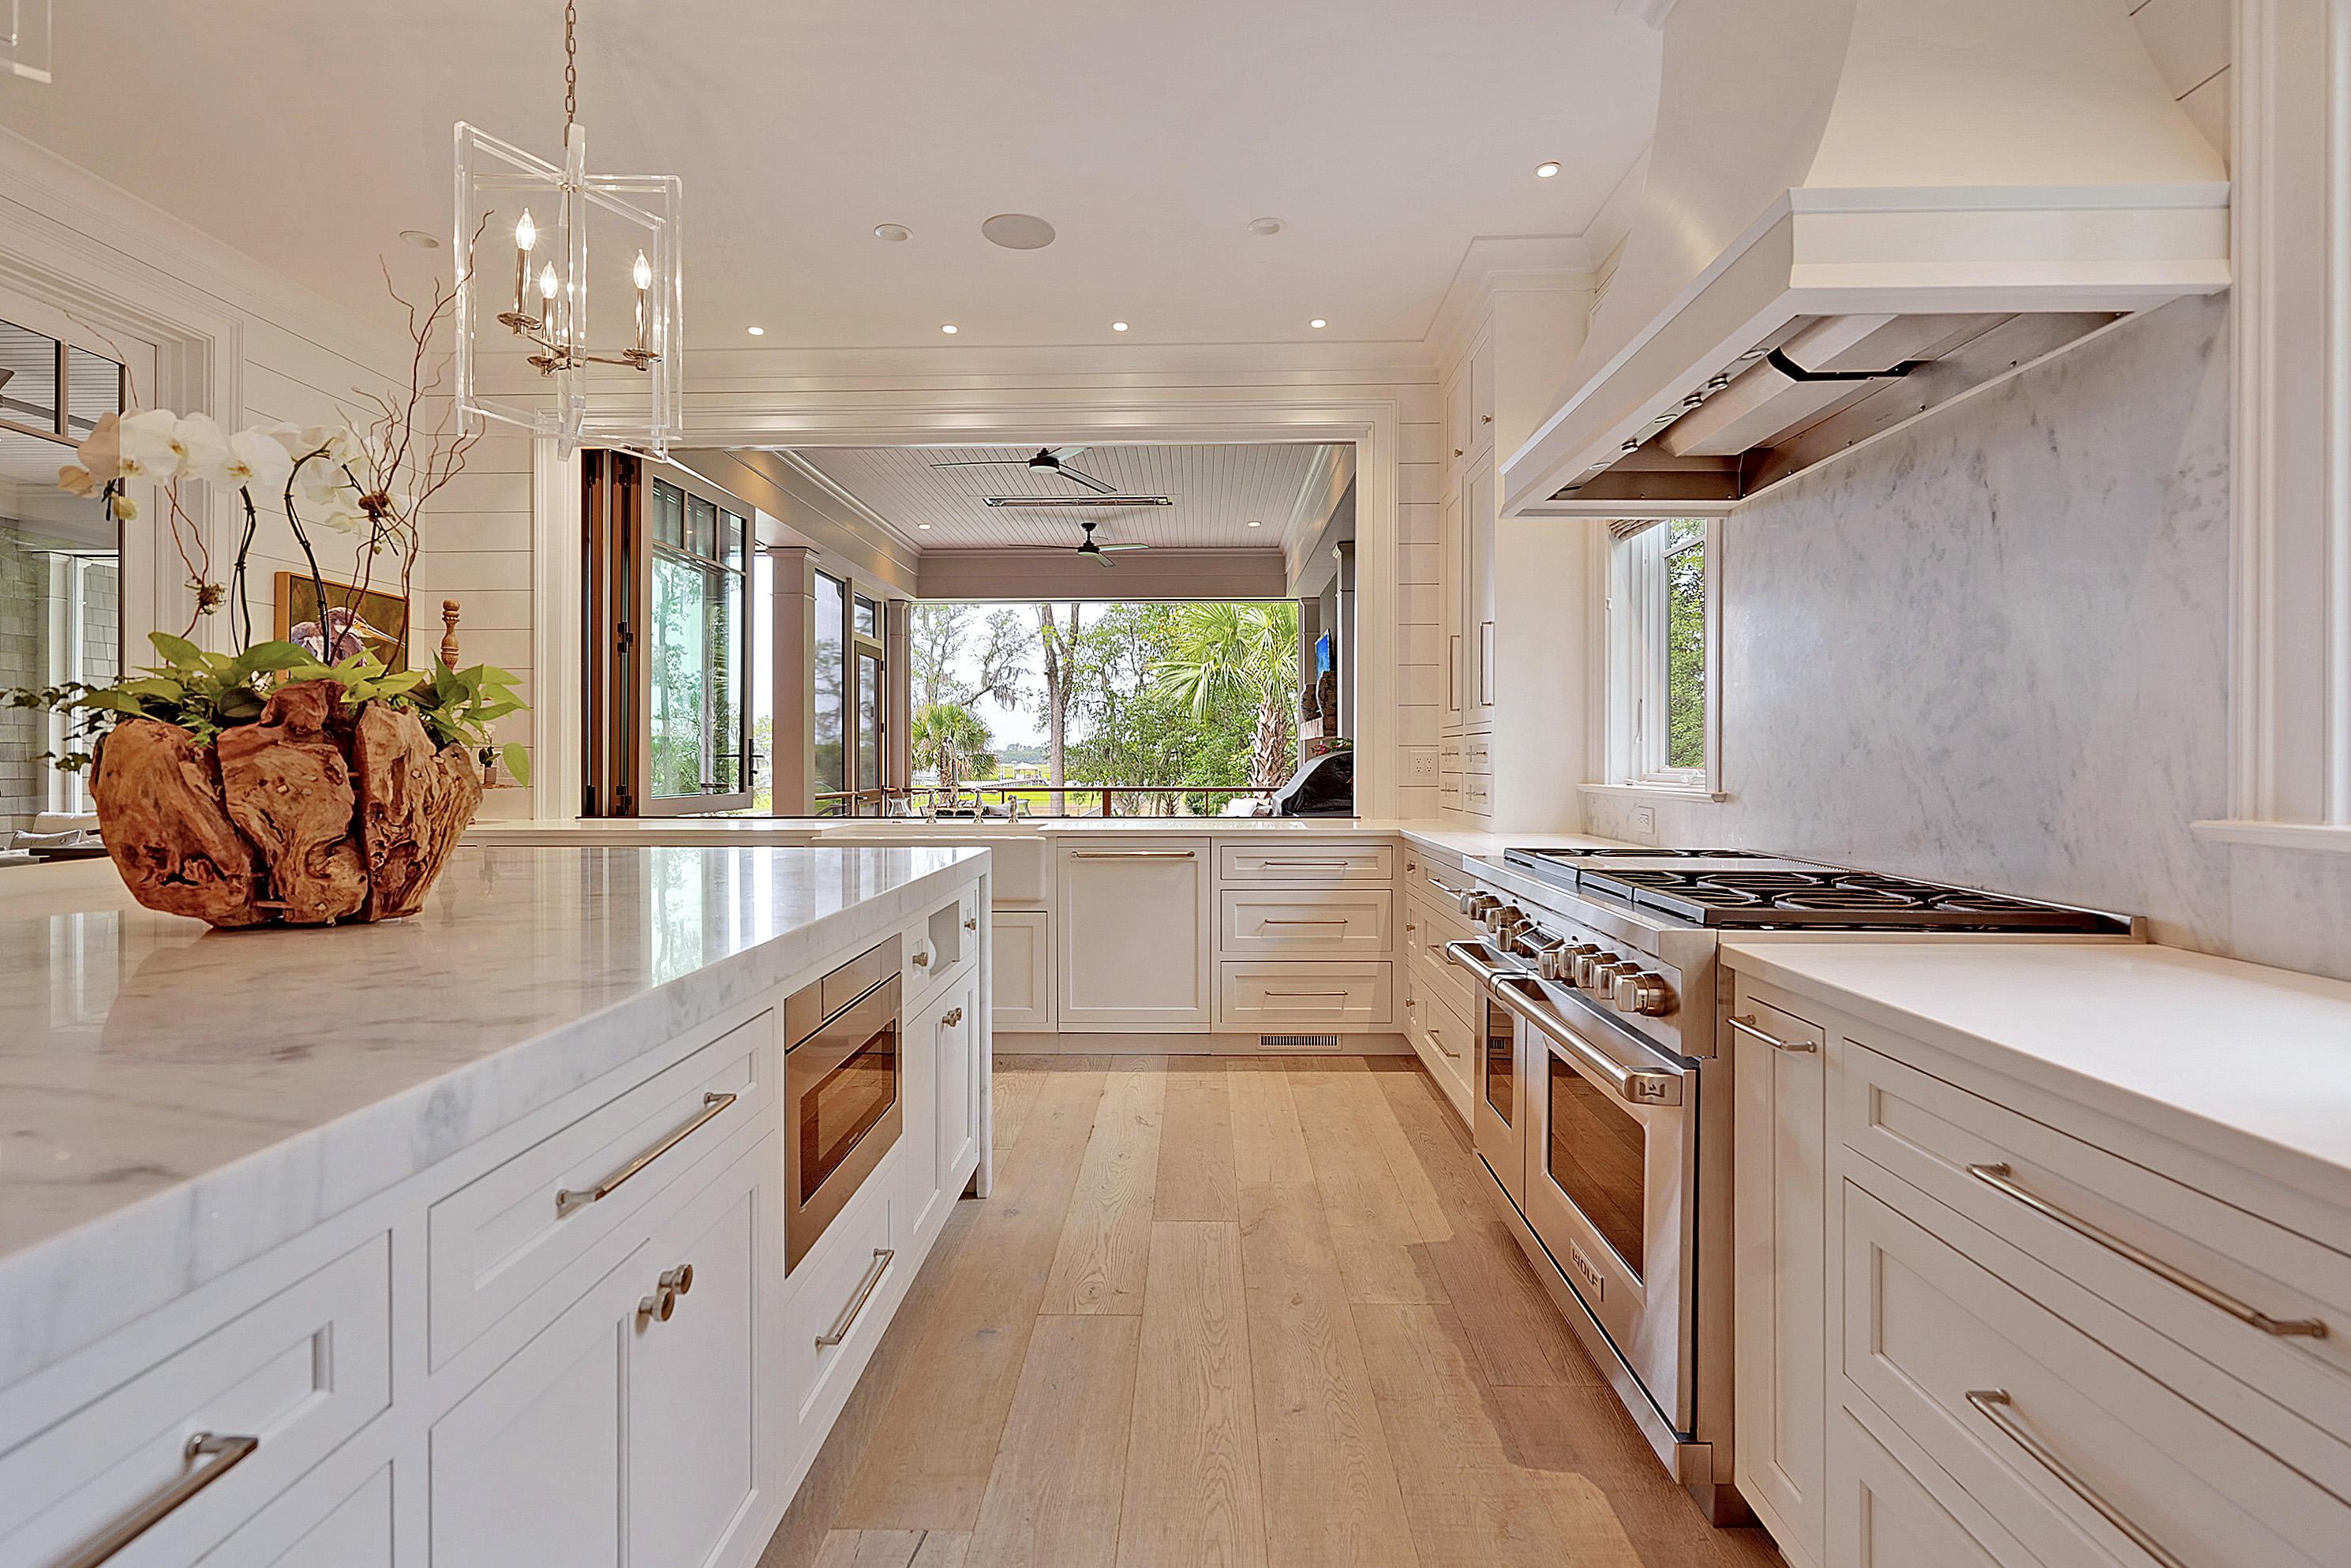 Beresford Hall Homes For Sale - 621 Barbados, Charleston, SC - 28